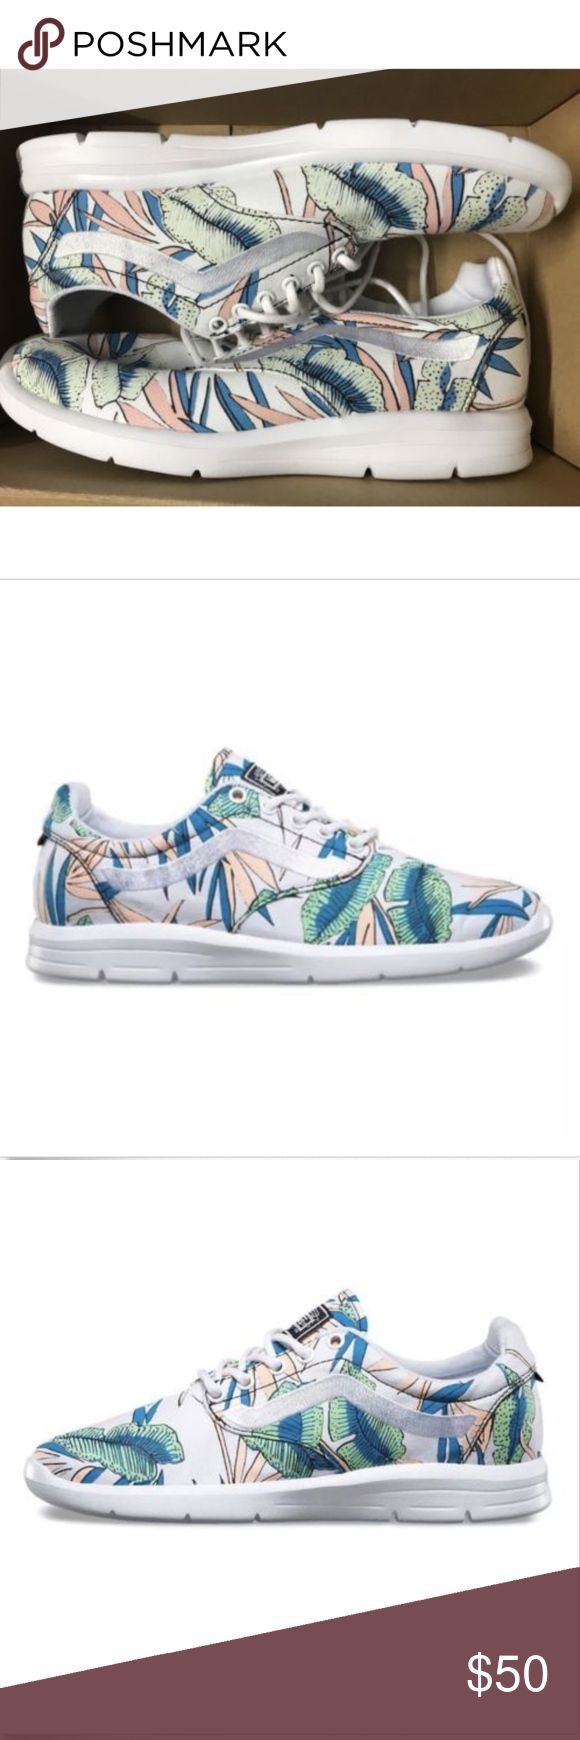 Vans Iso 1.5 Tropical Leaves True White Vans Iso 1.5 Tropical Leaves True White  Size Men 7.5 Women 9 Brand new in box Vans Shoes Athletic Shoes